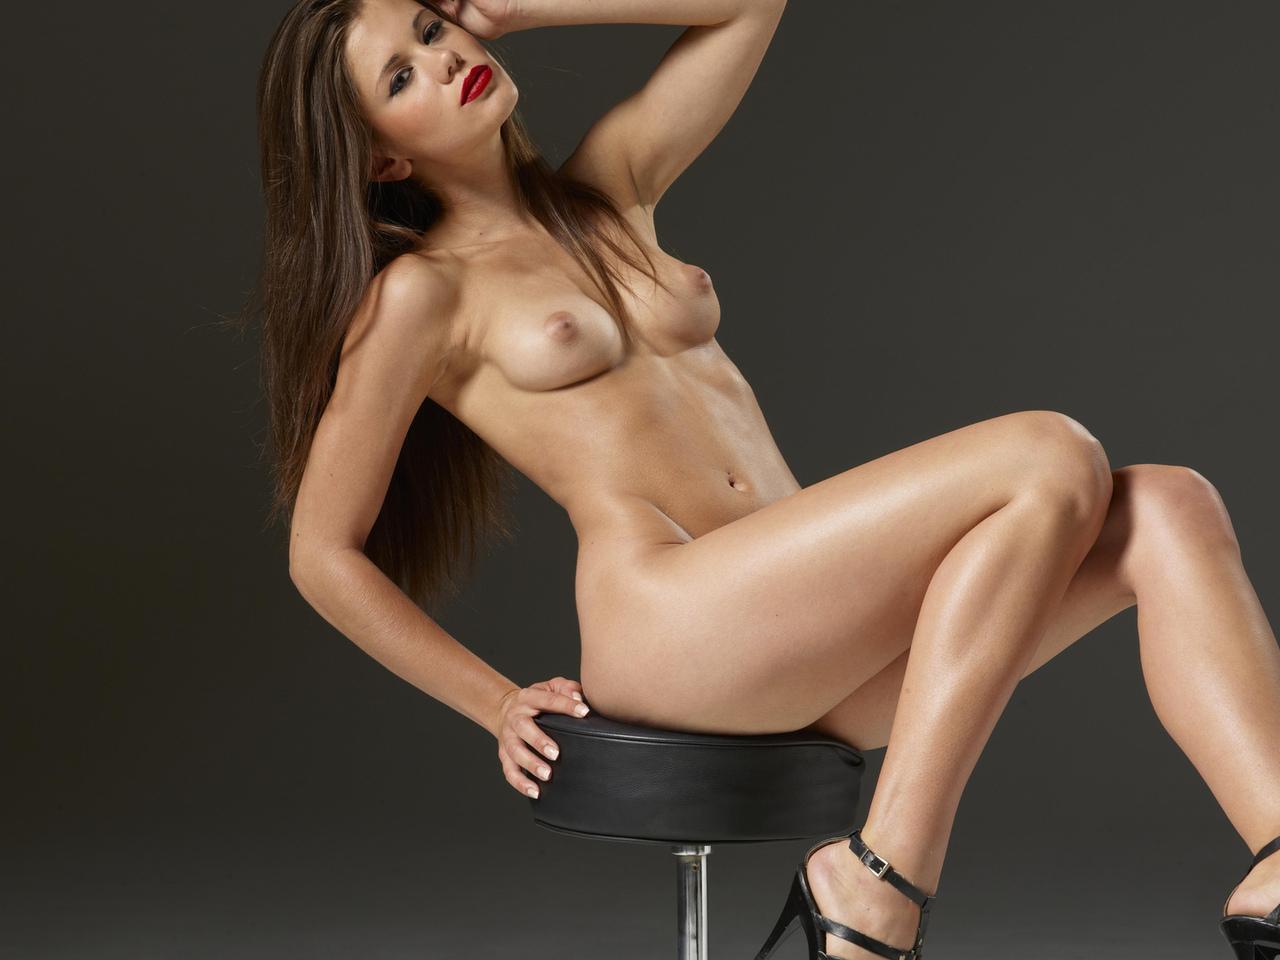 на стуле, поза, девушка, ножки, голая, красивая, грудь, лицо